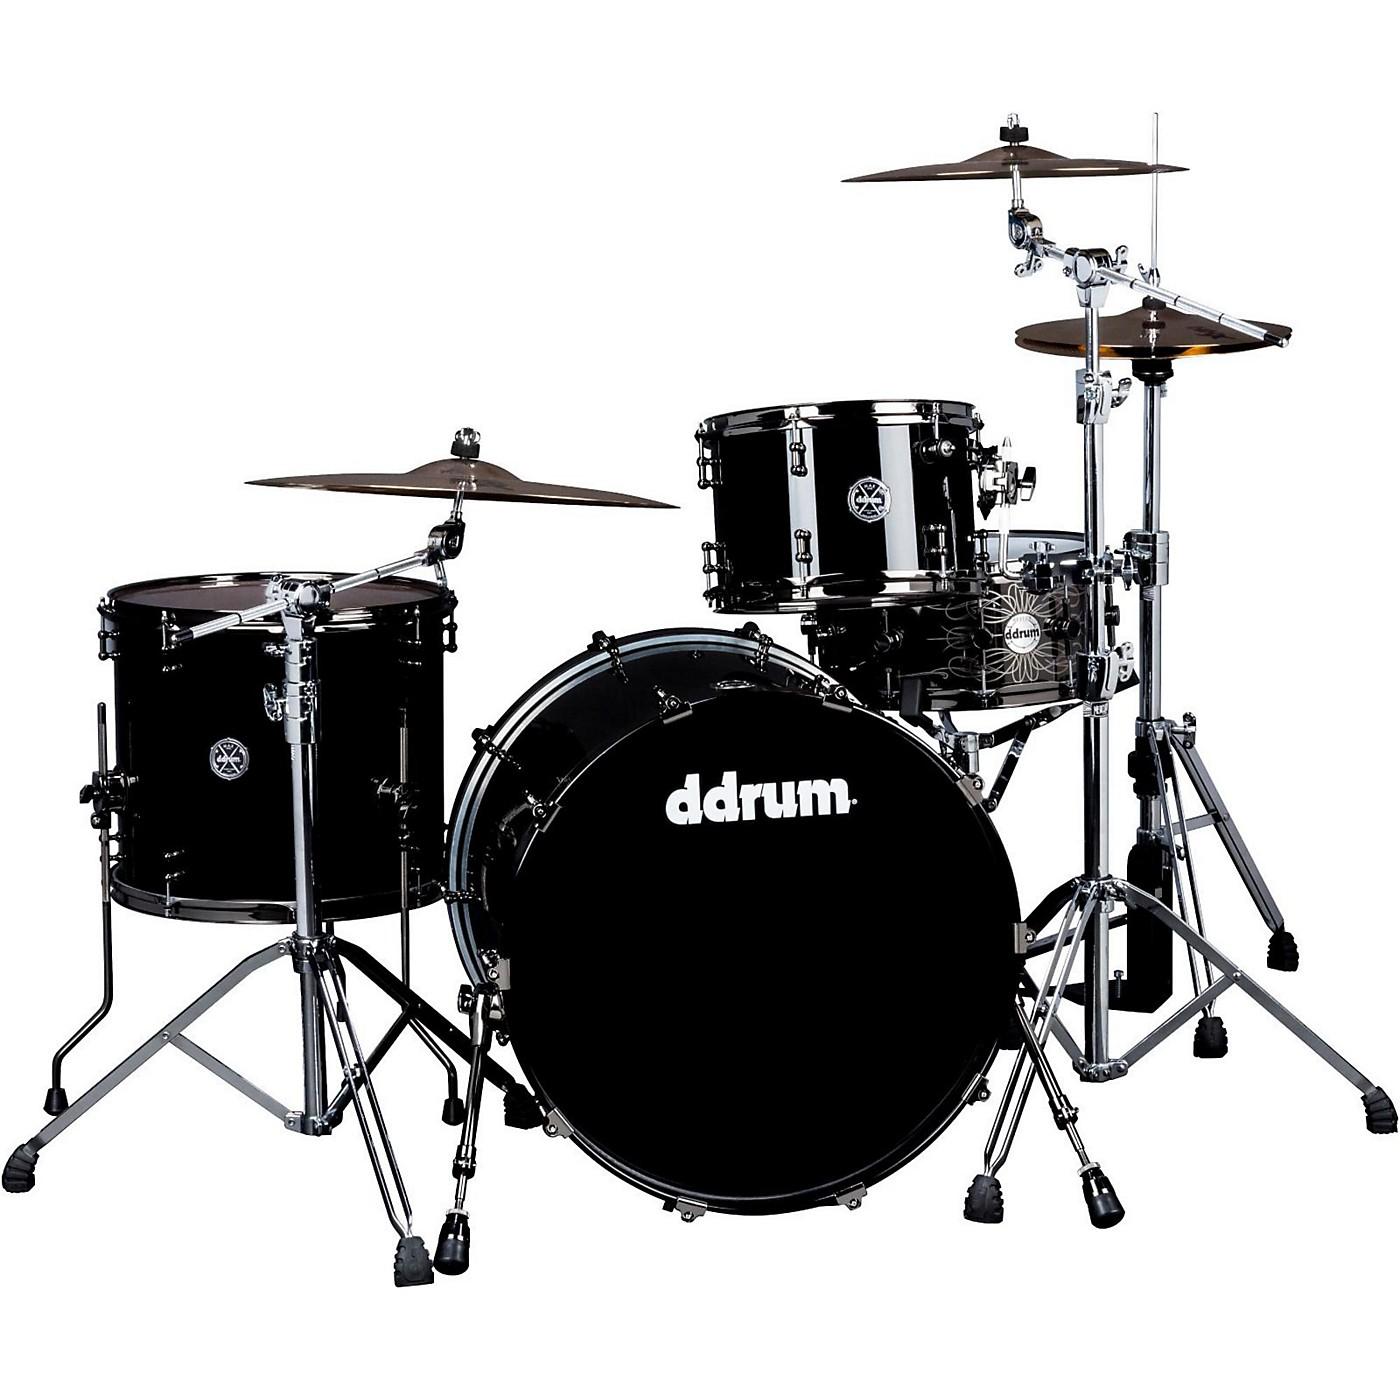 ddrum MAX Series 3-Piece Maple Alder Drum Set thumbnail